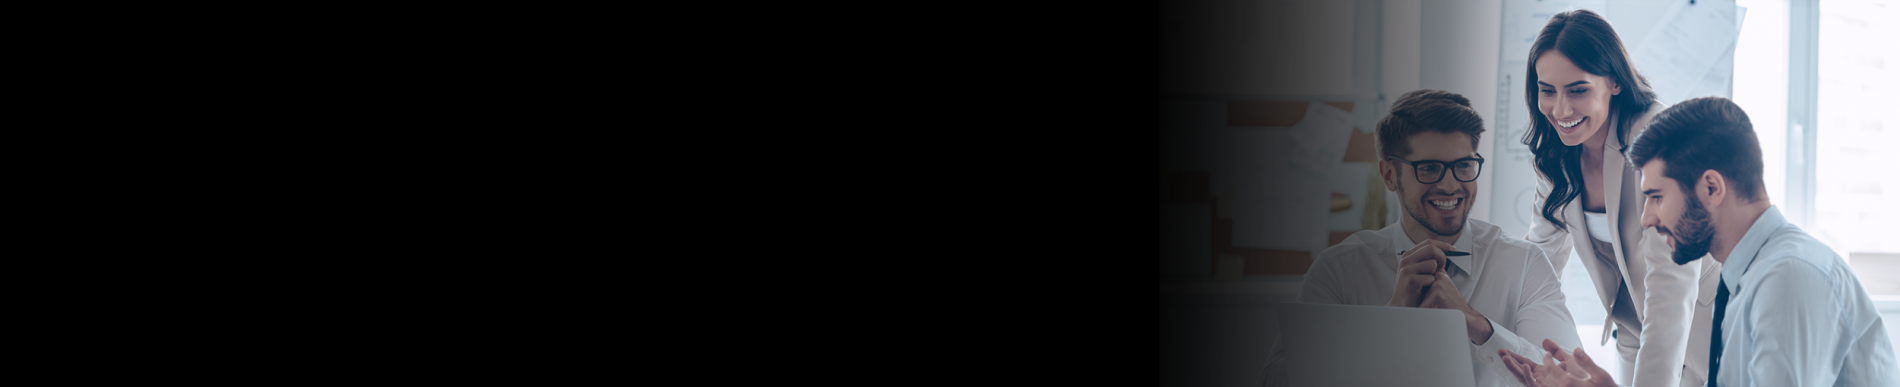 FUJITSU Enterprise Postgres - Overview